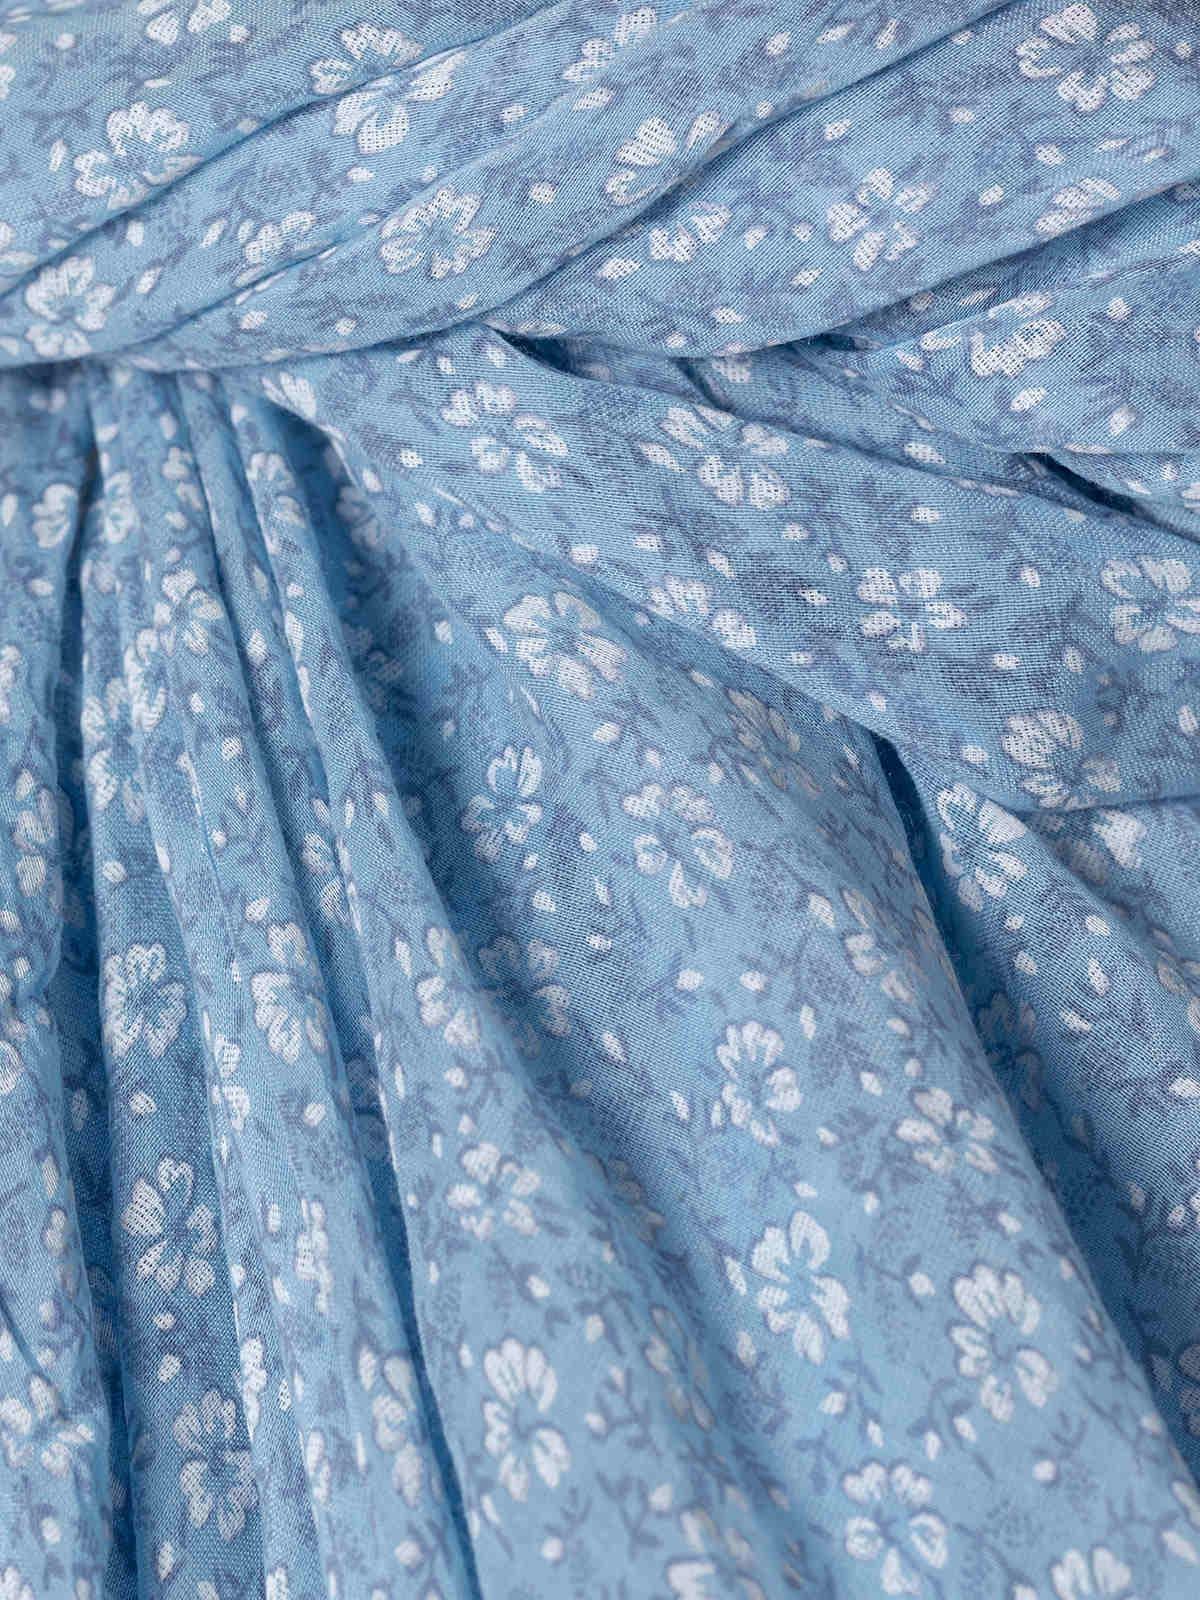 Fular mujer algodón flor monocromático Azul Celeste